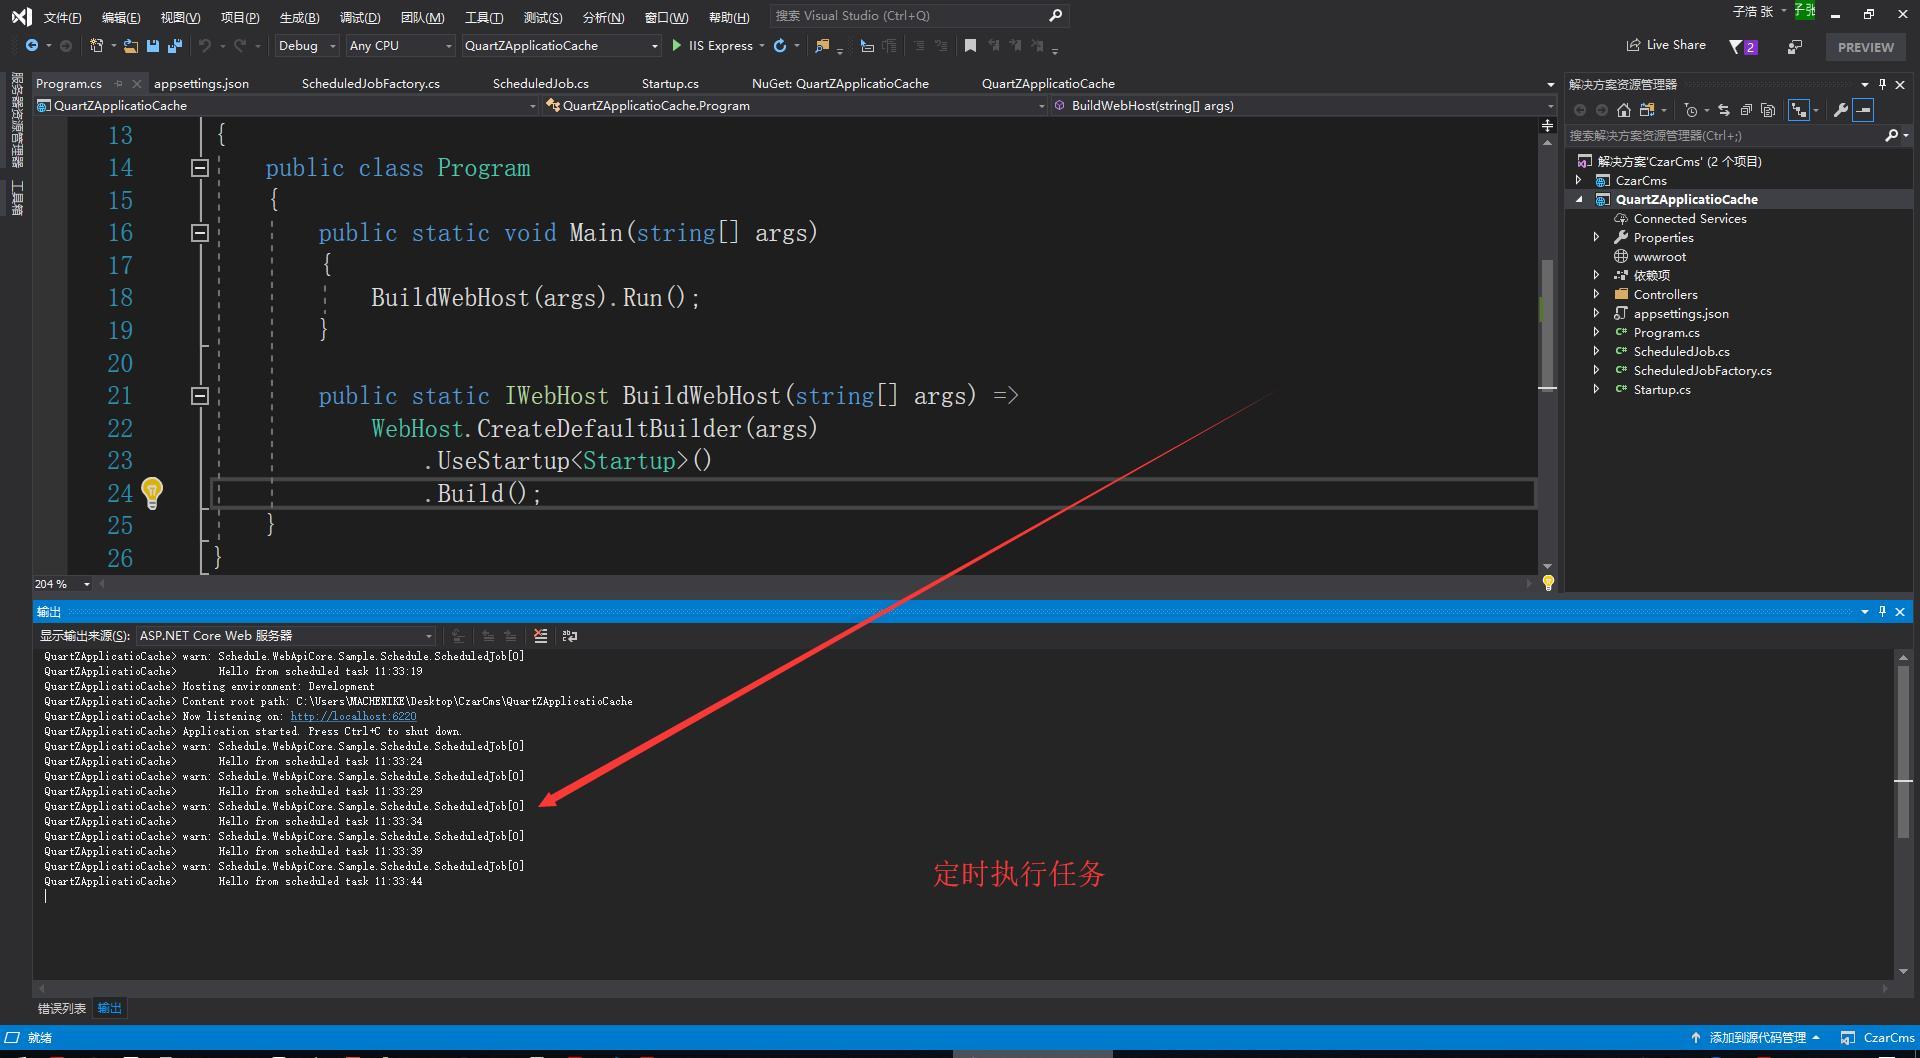 configurationbuilder().setbasepath(directory.getcurrentdirectory()).addjsonfile( appsettings.json )